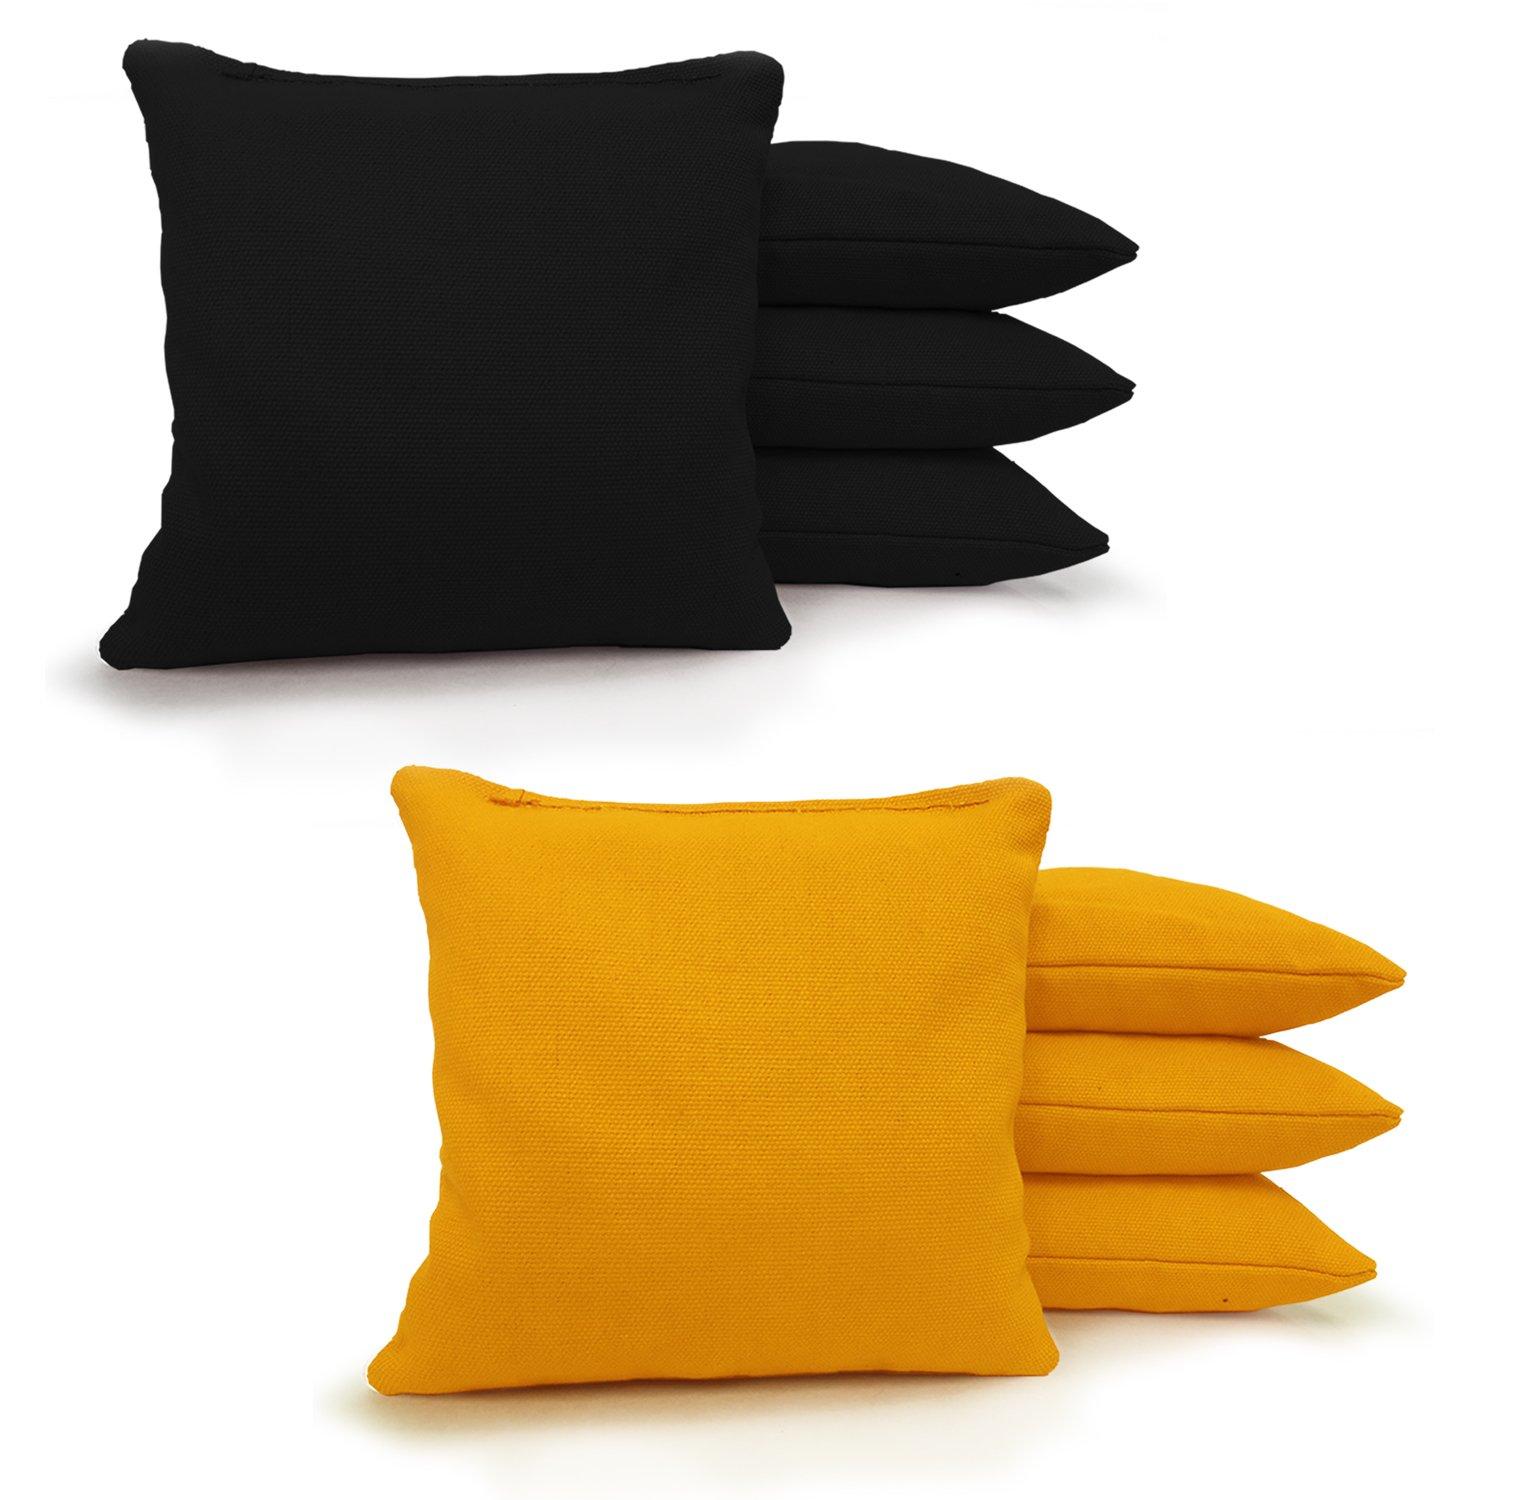 8 Standard Corn Filled Regulation Duck Cloth Cornhole Bags! (Black/Yellow)